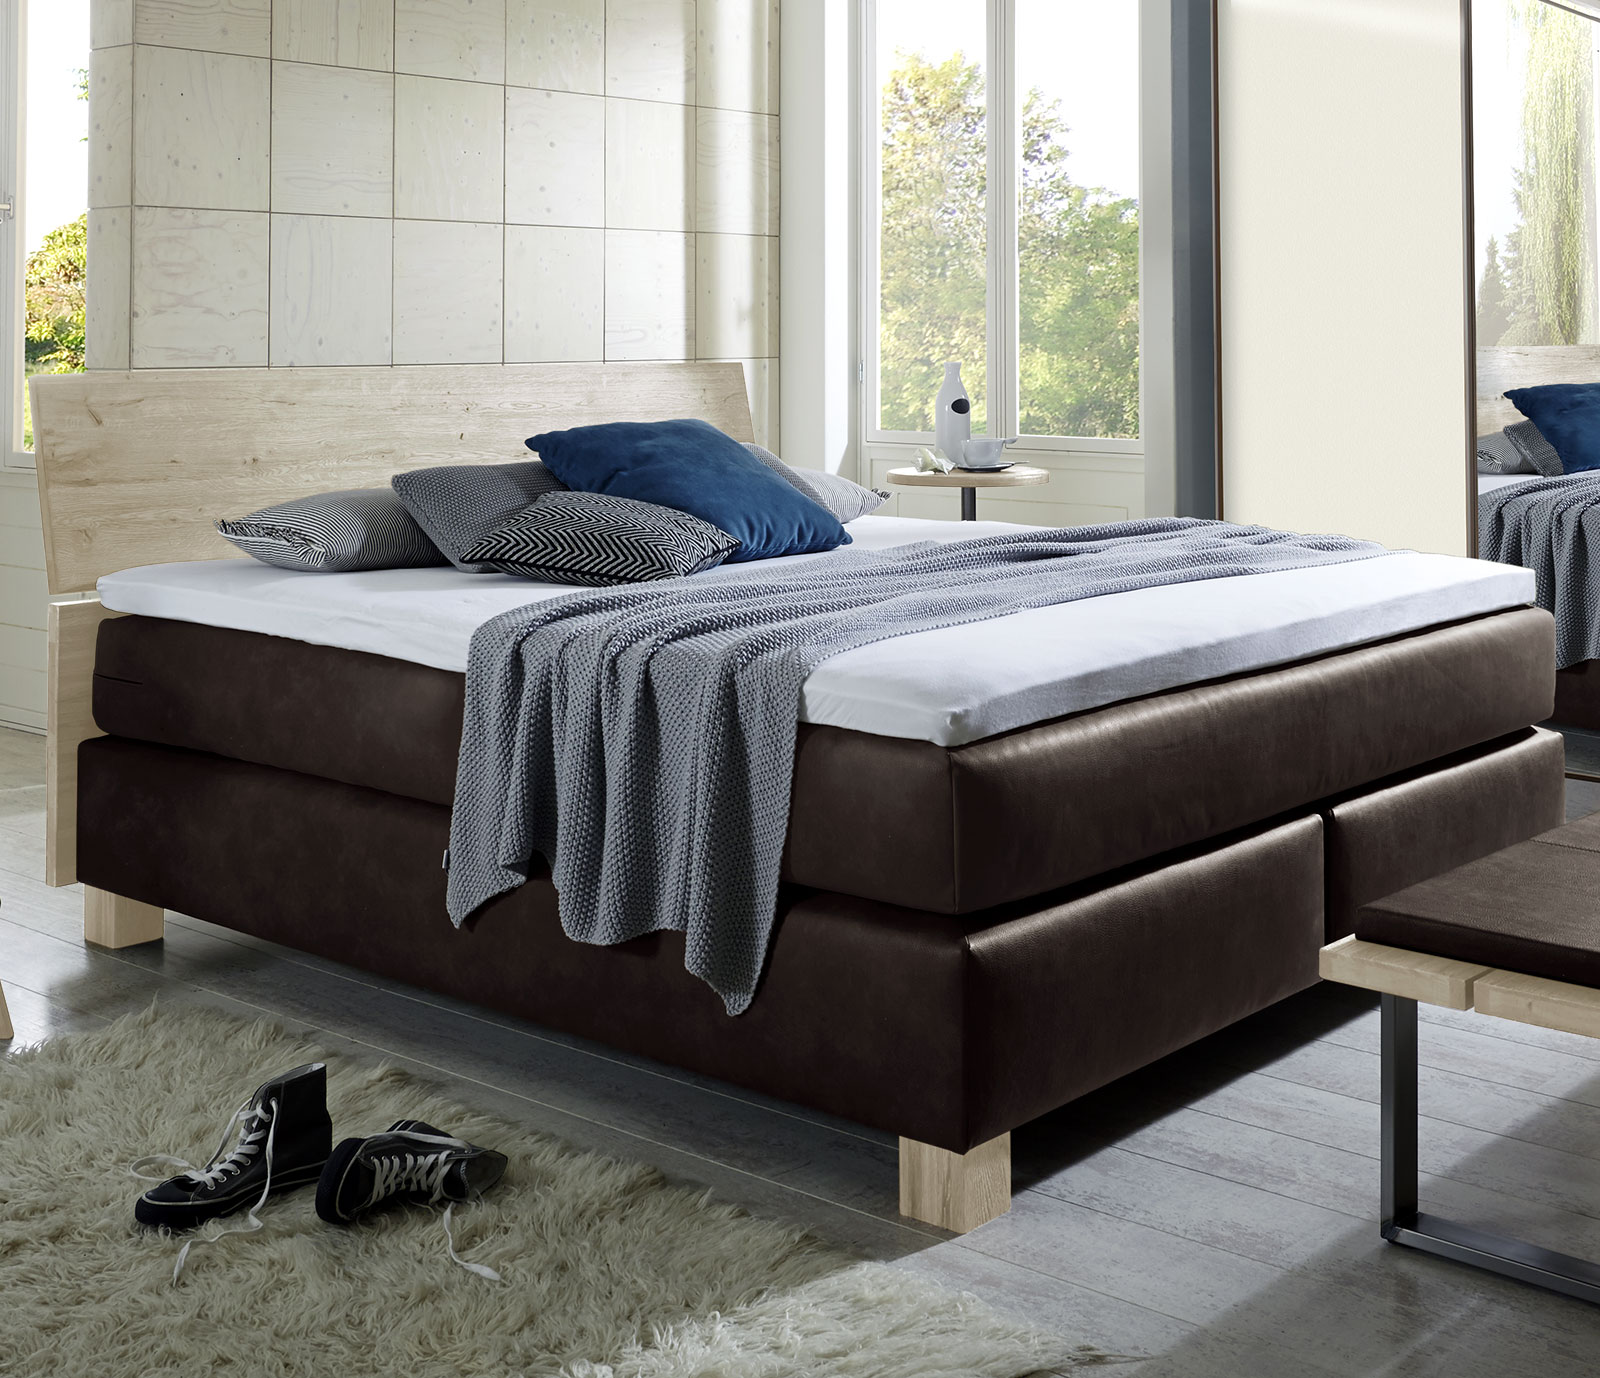 boxspring doppelbett mit geneigtem kopfteil aus holz avila. Black Bedroom Furniture Sets. Home Design Ideas